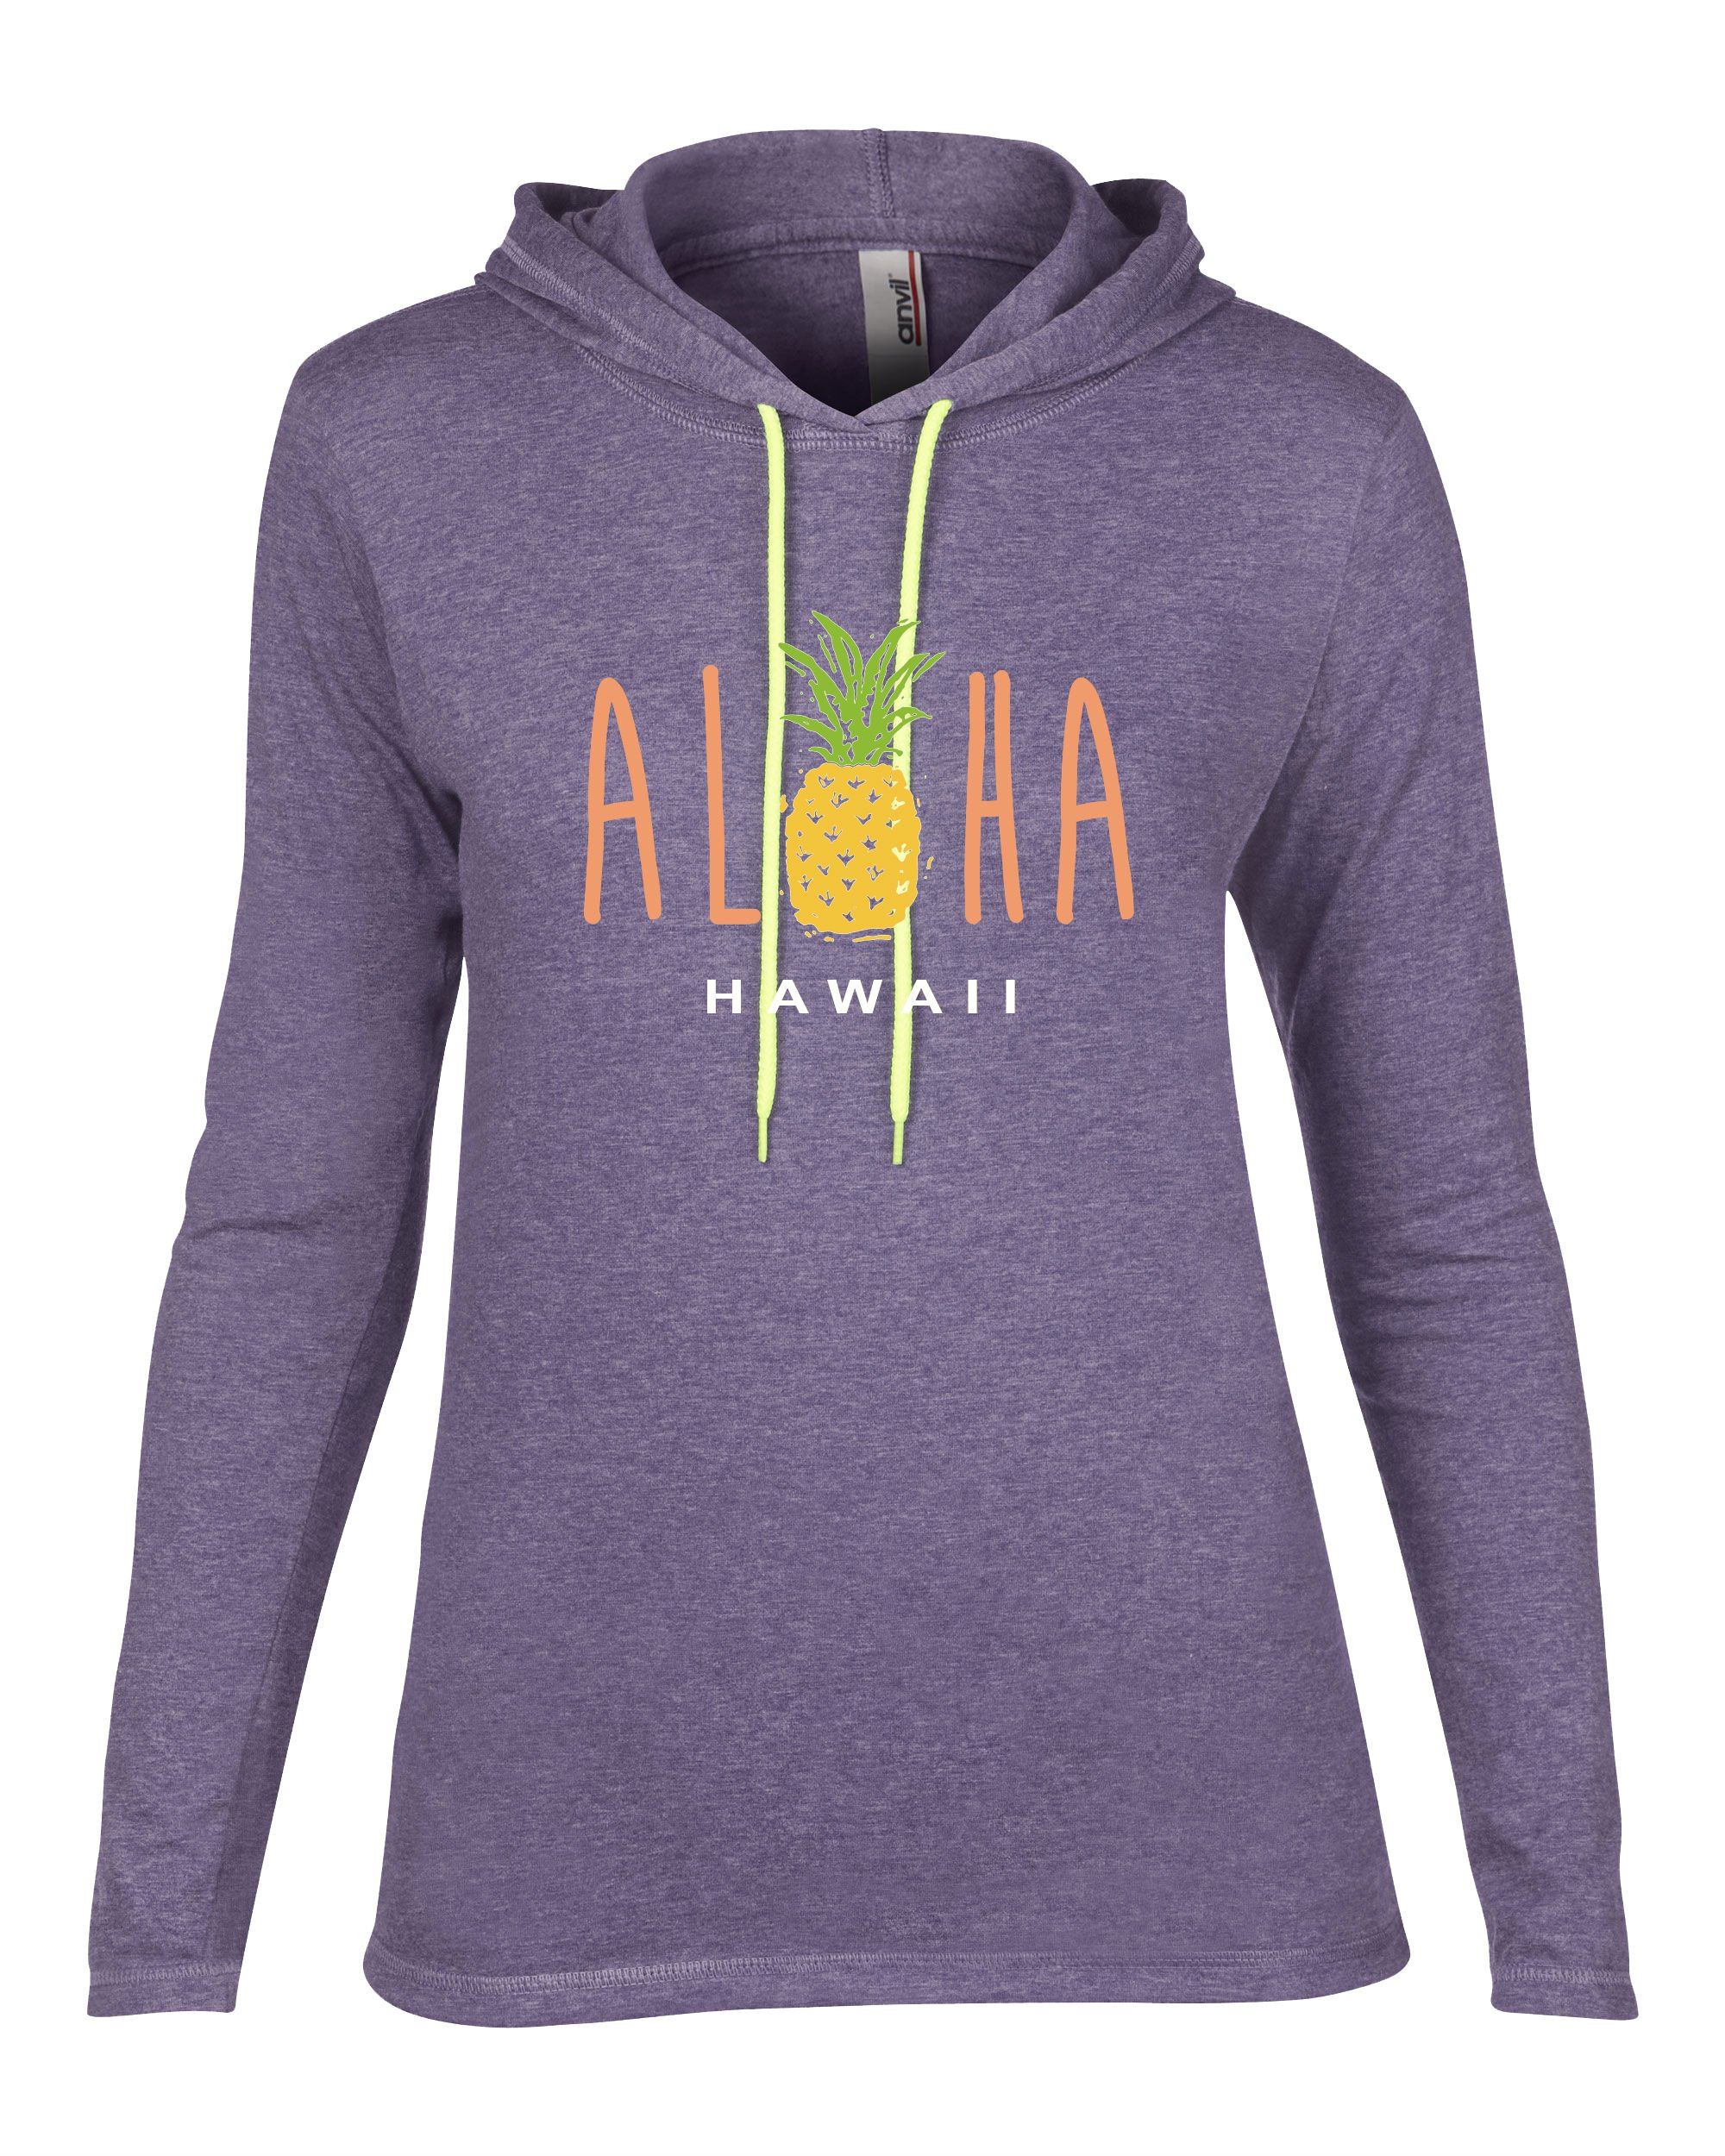 Rachel Jordan RJ Junior's You Had Me at Aloha Lightweight Long Sleeve Pullover Hoodie (XL, Heather Purple)